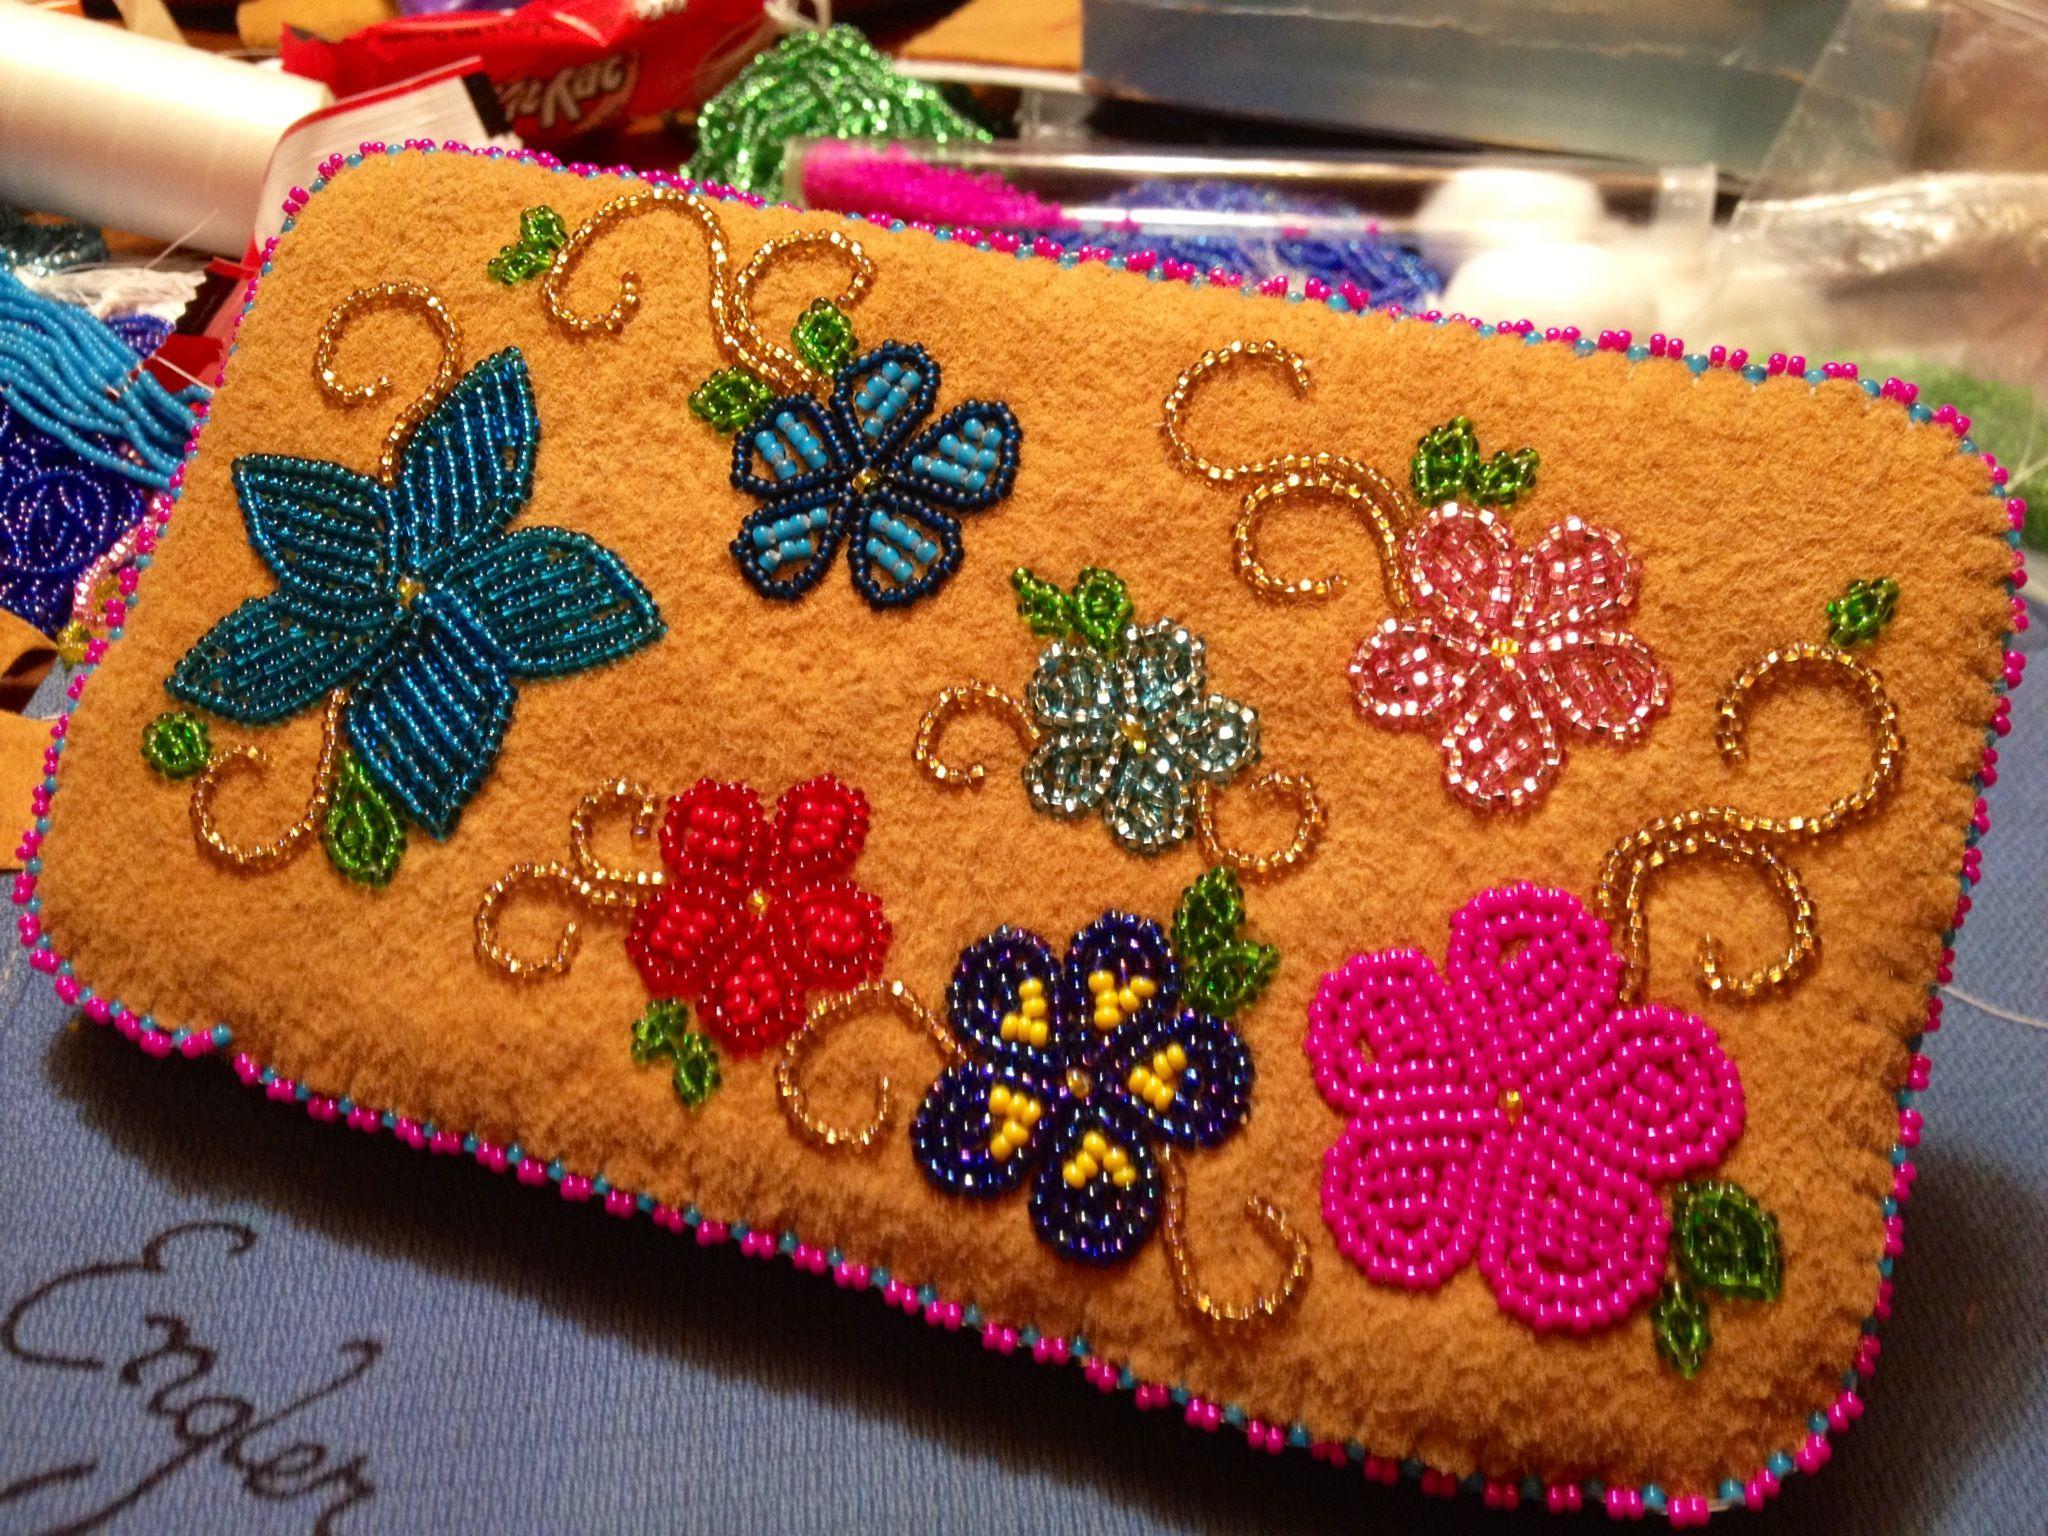 Beaded Wallet Made By Julianna Engler 907engler